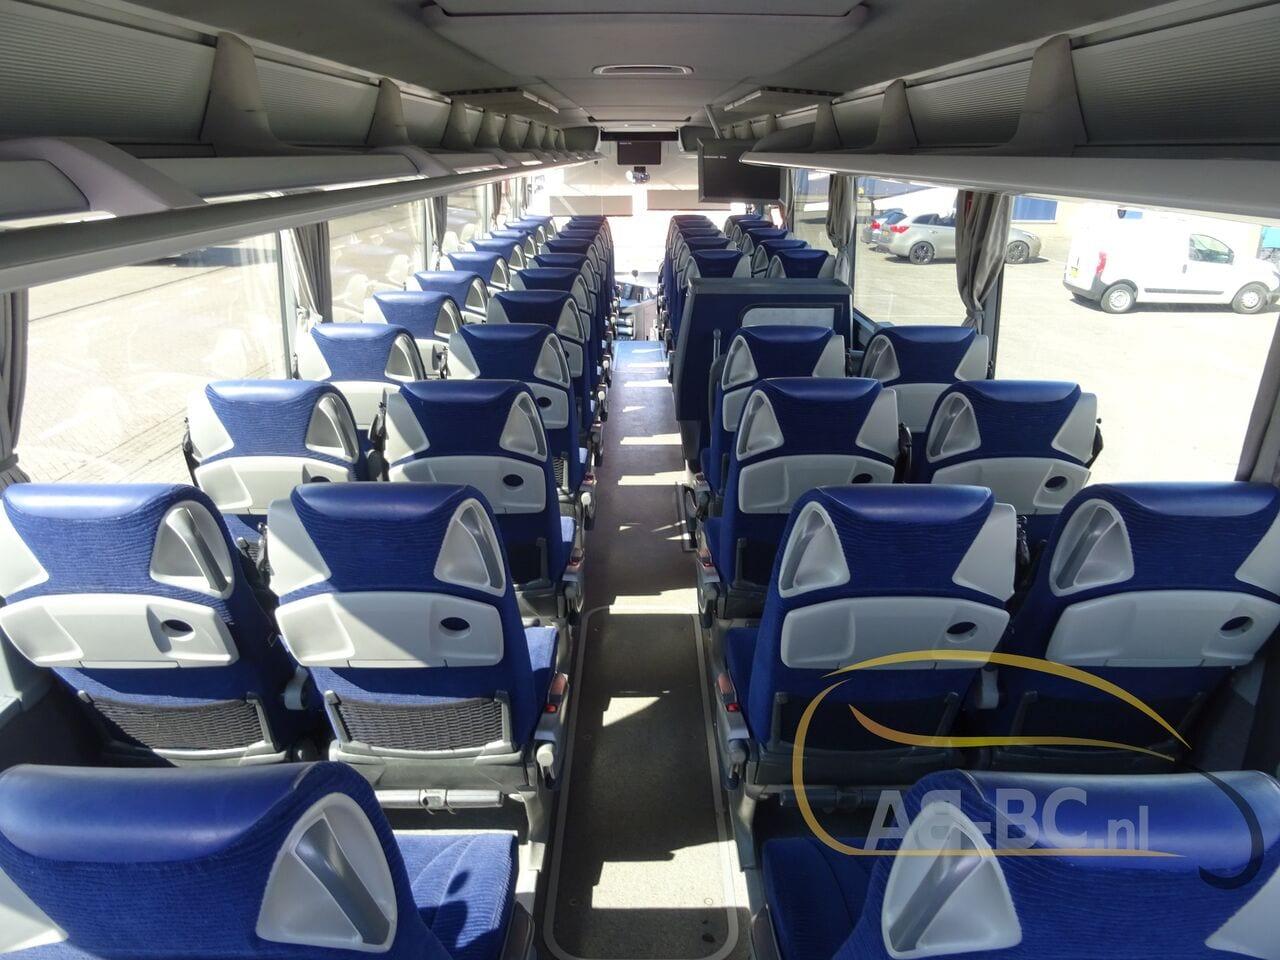 coach-busSETRA-S415-GT-HD-FINAL-EDITION-51-SEATS-LIFTBUS---1620382099536973366_big_31e79f6fa0ab860db232ea76100e6382--21050713010665719300